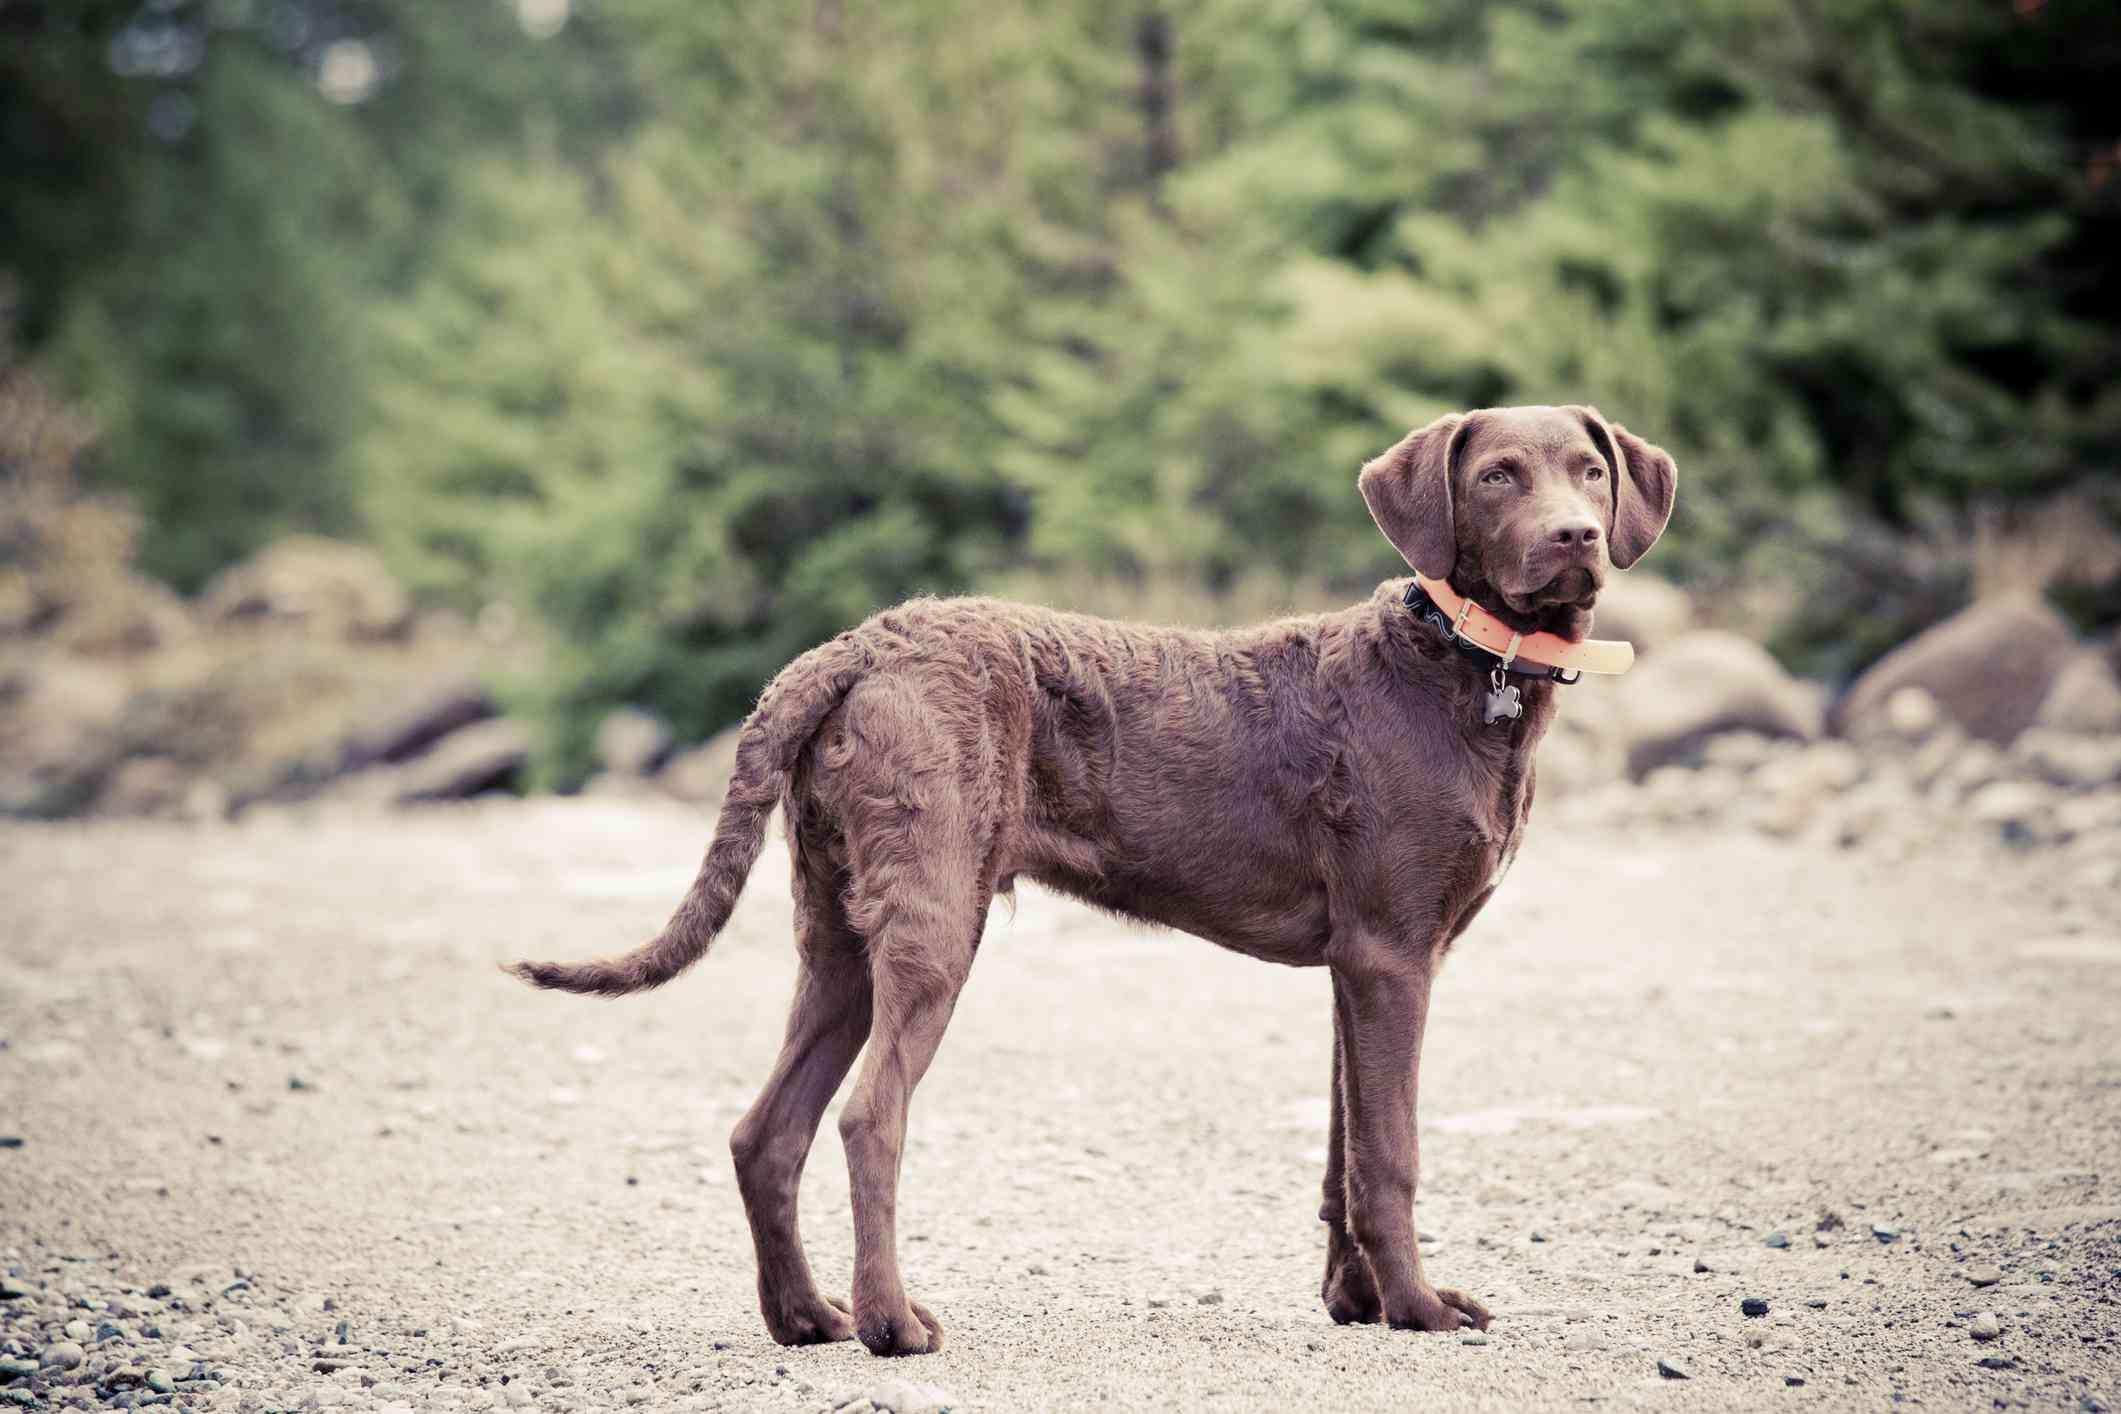 A Chesapeake Bay Retriever Puppy